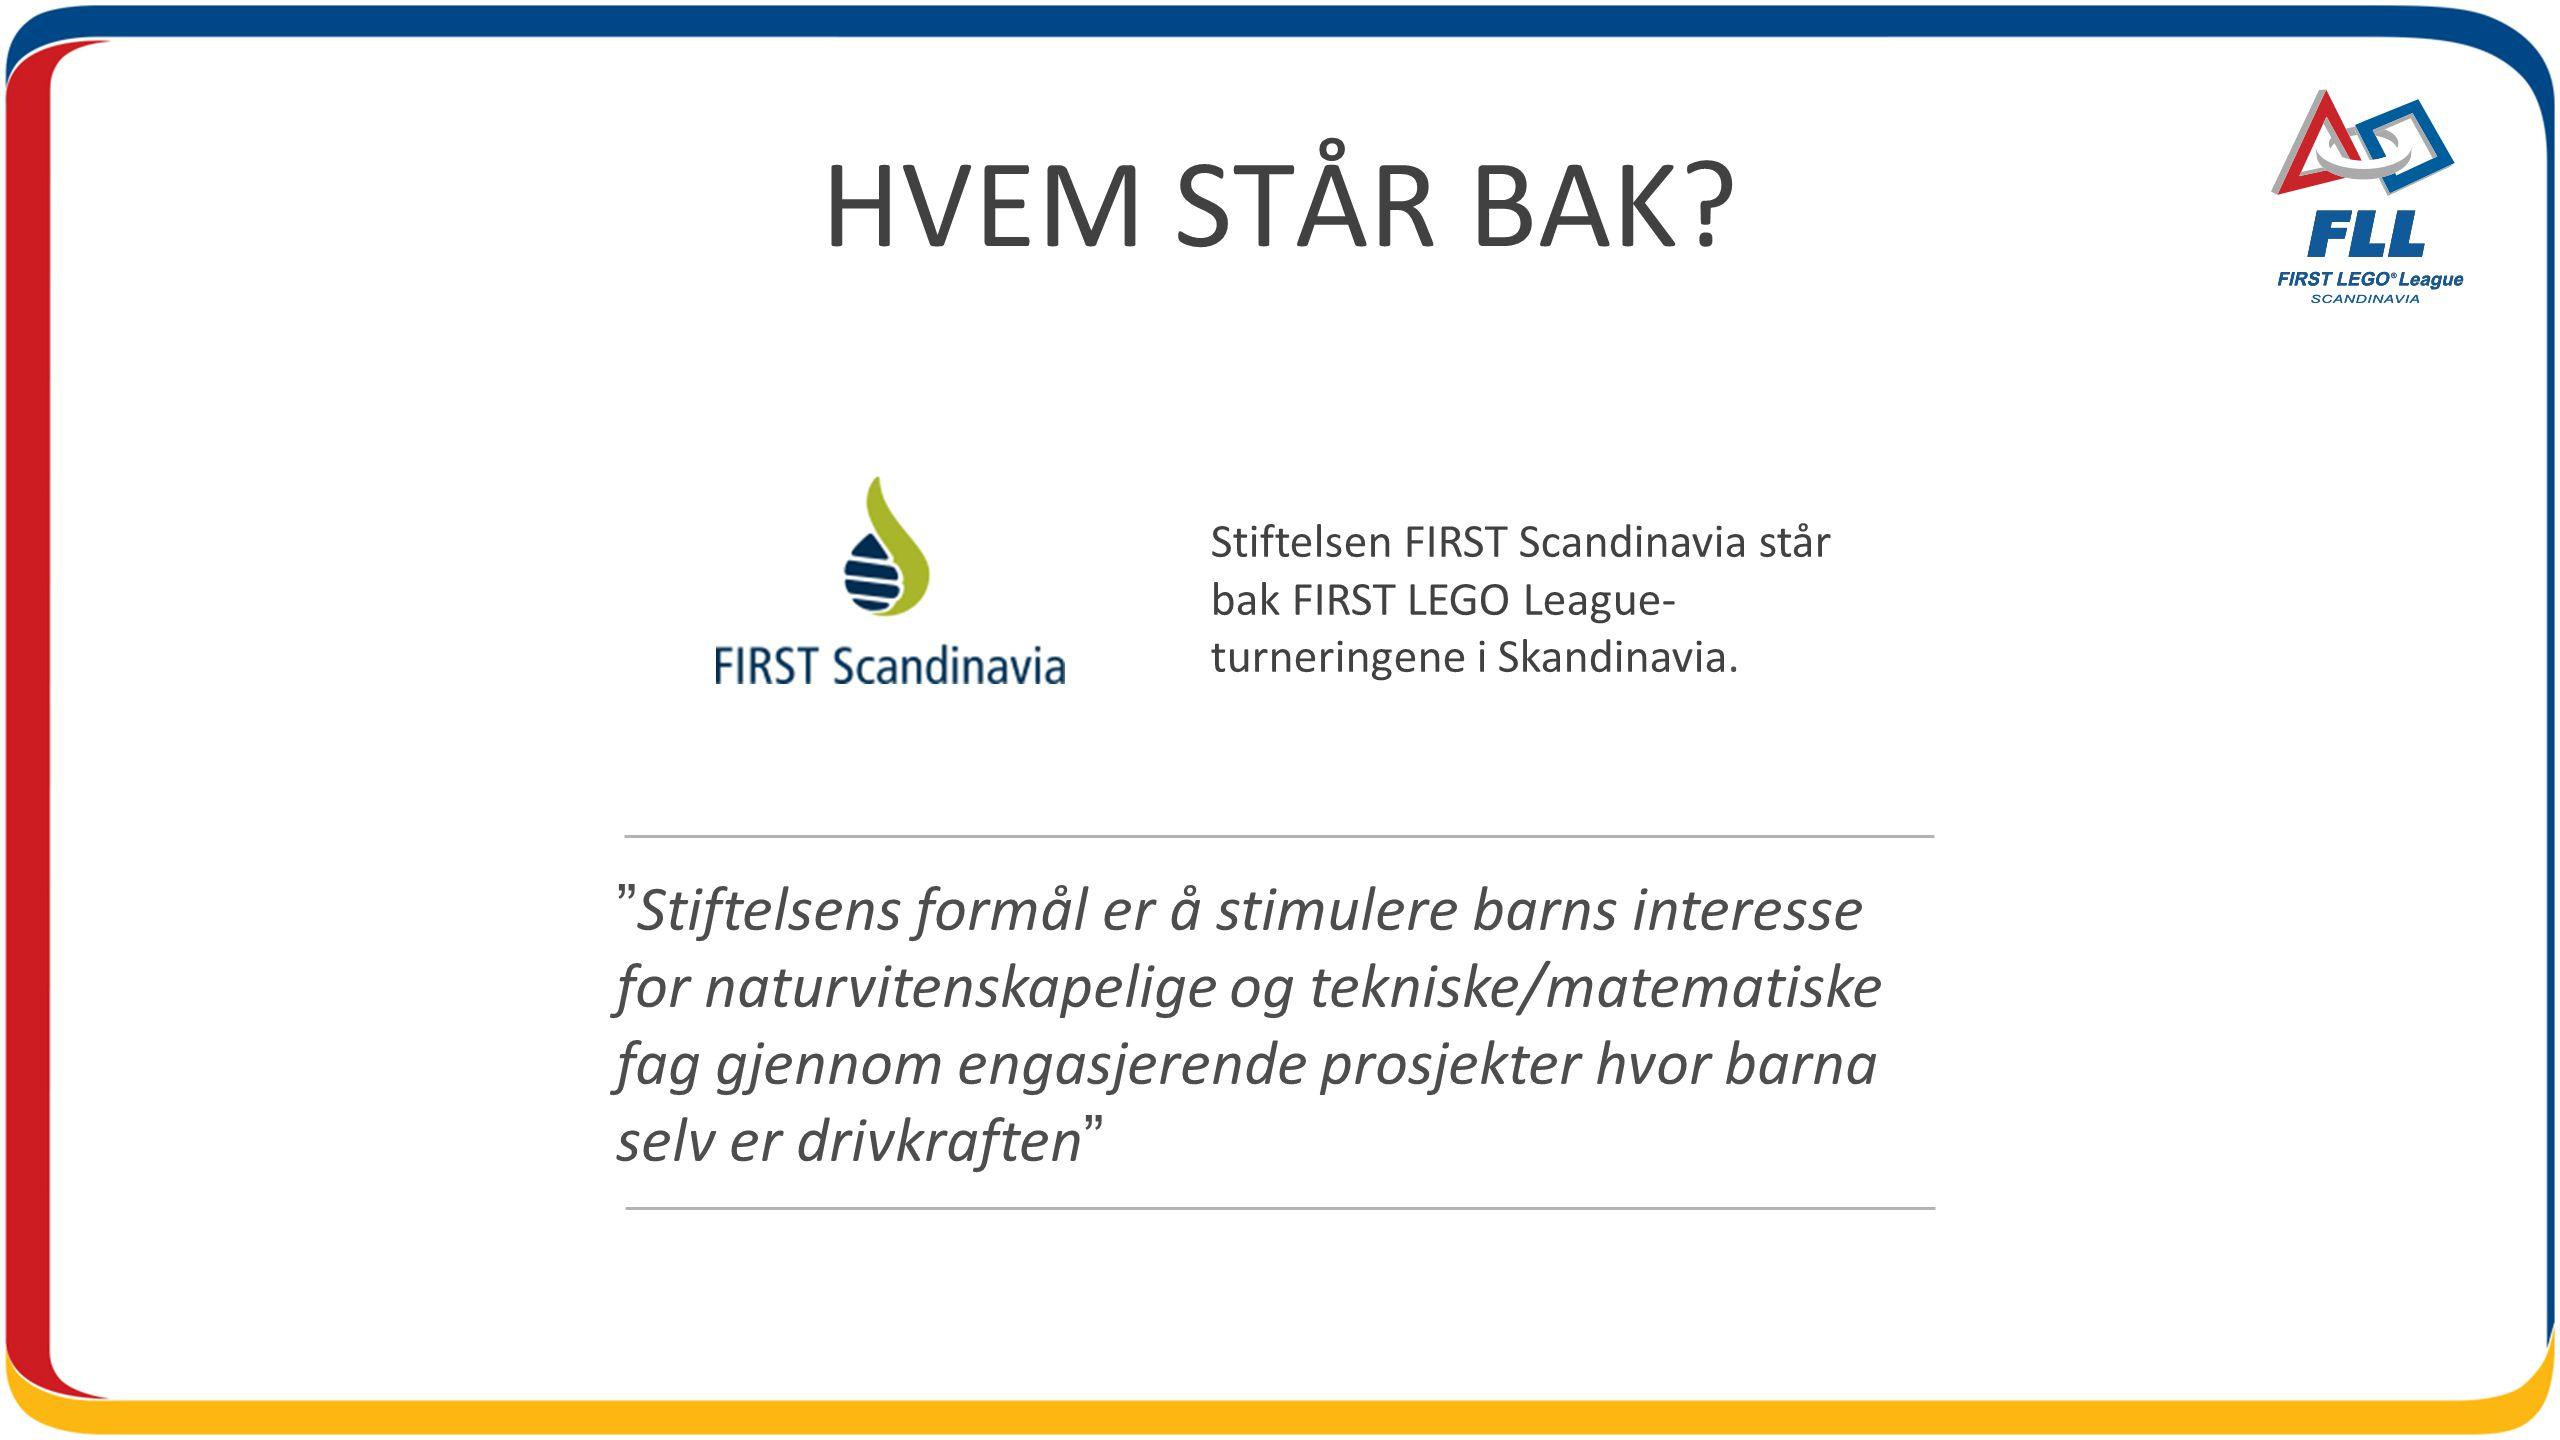 HVEM STÅR BAK.Stiftelsen FIRST Scandinavia står bak FIRST LEGO League- turneringene i Skandinavia.